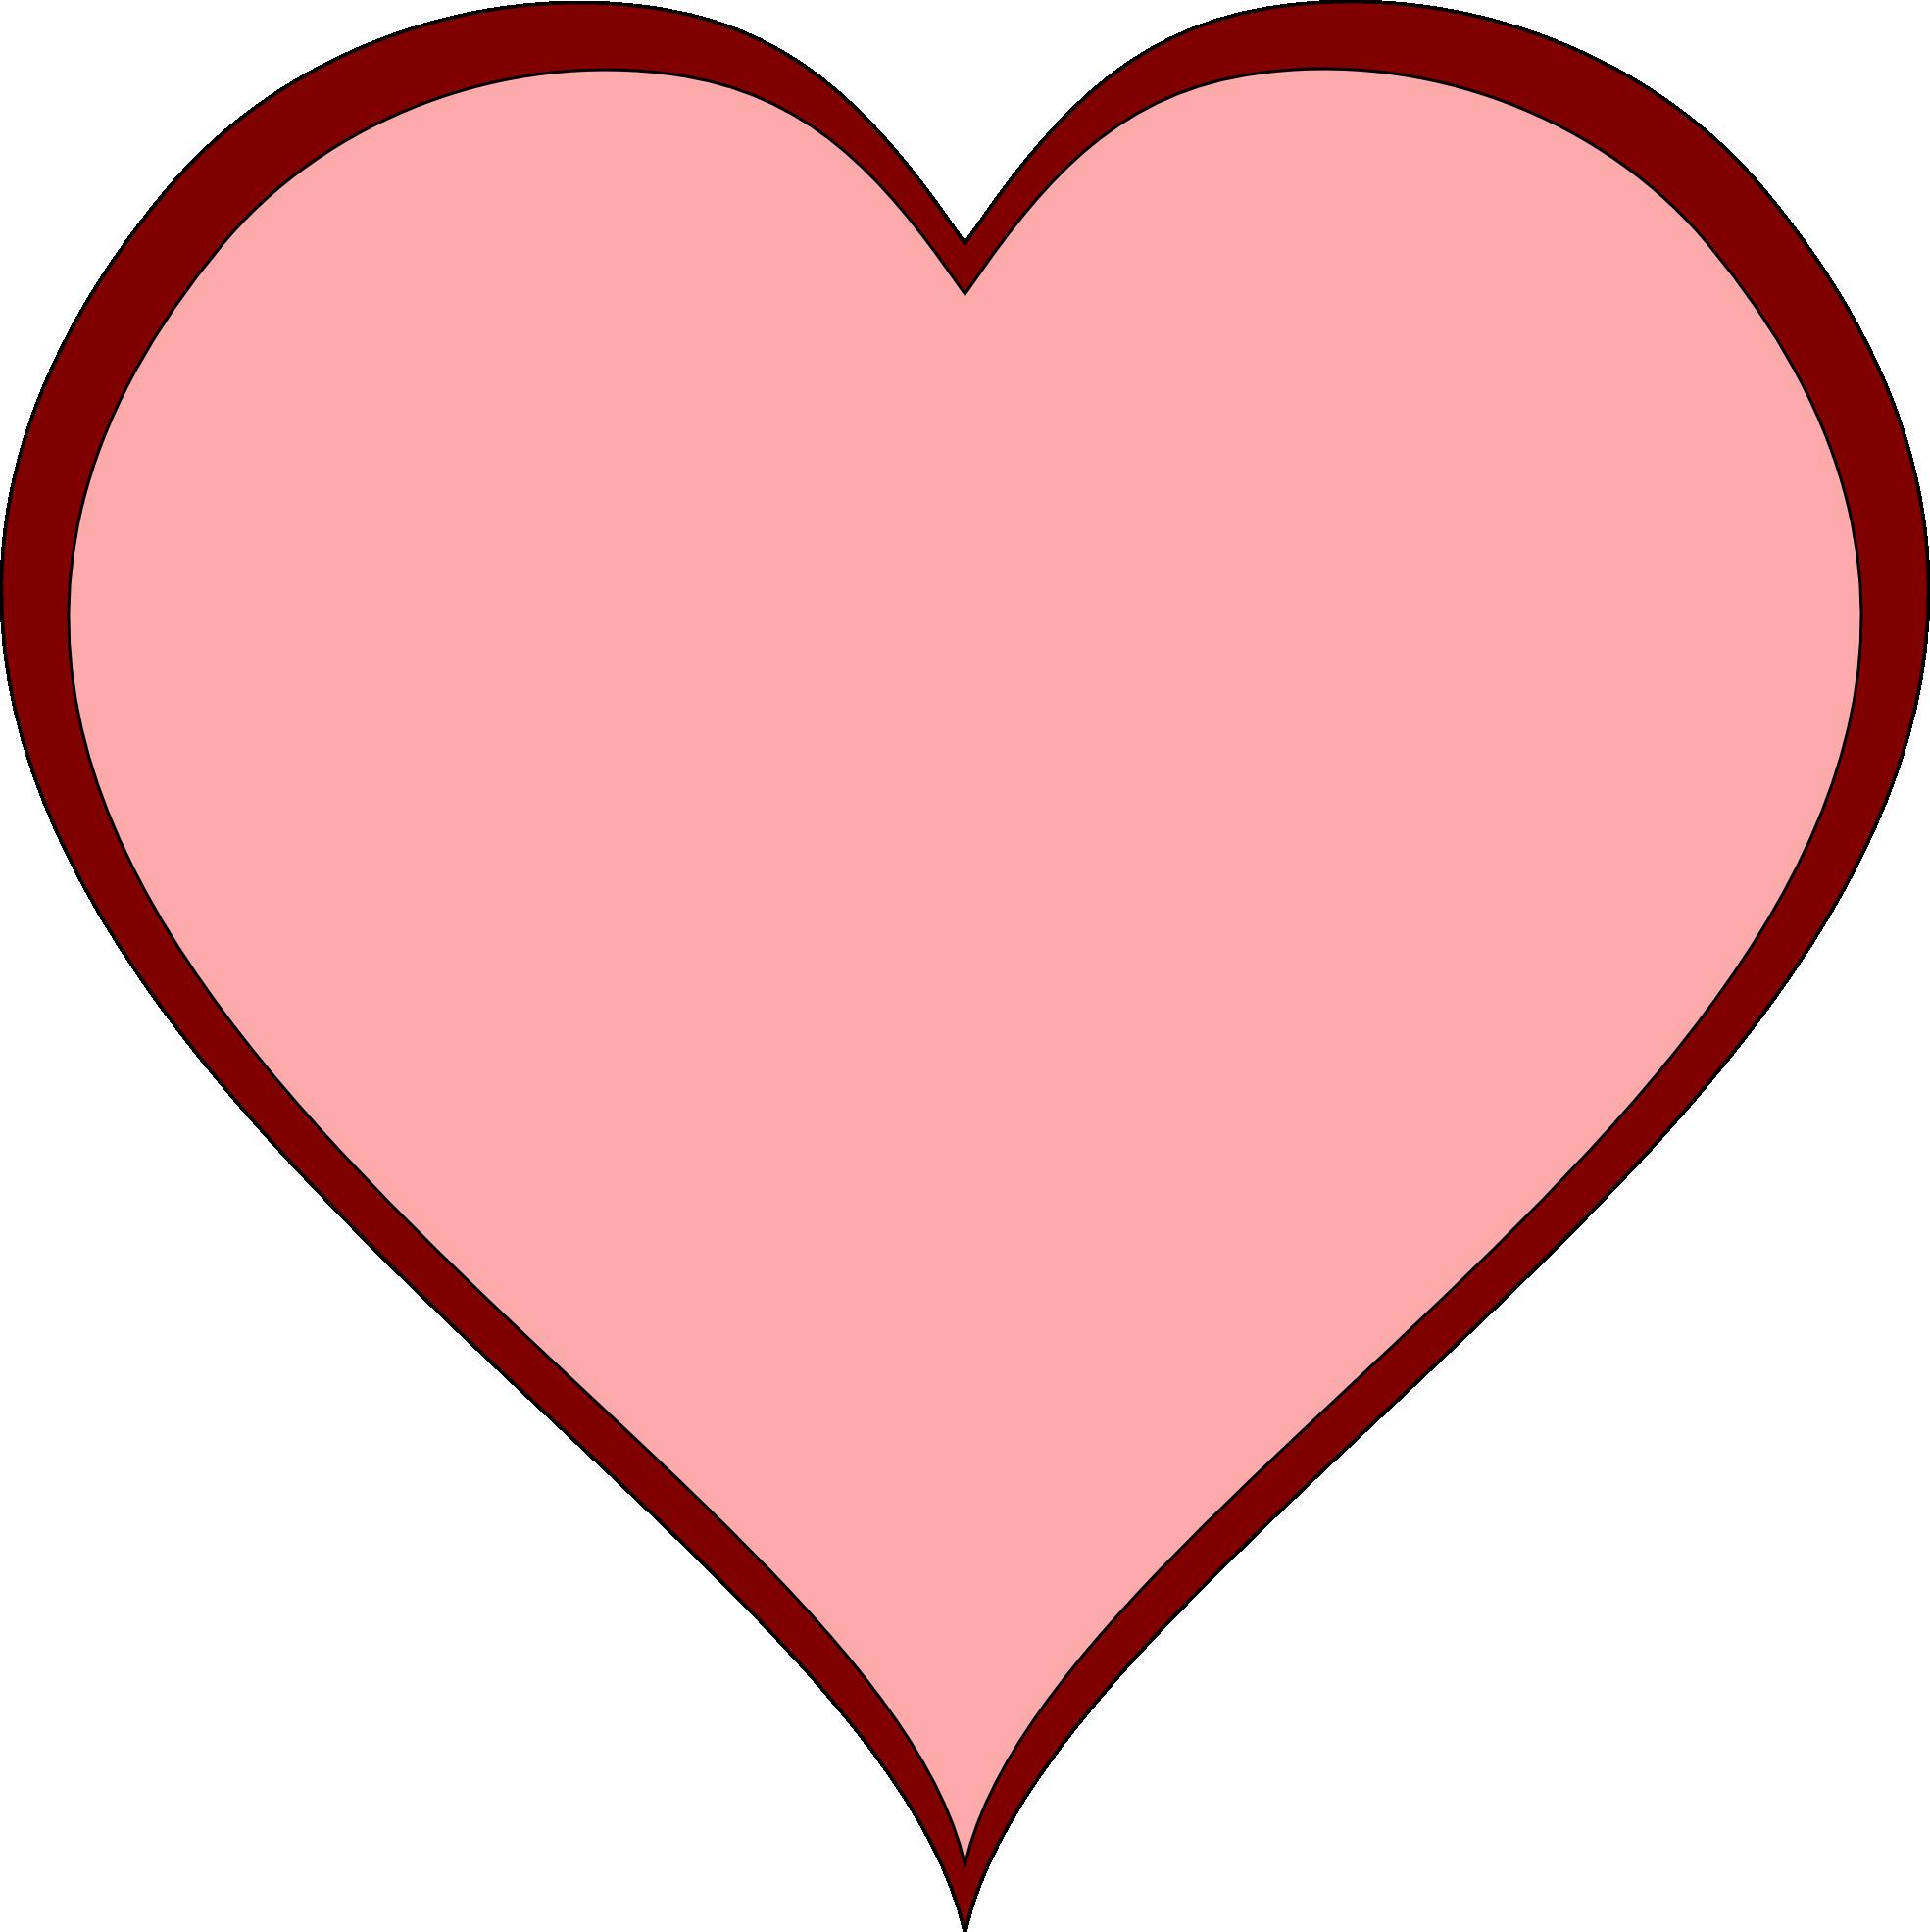 Heart-shaped clipart open heart #7